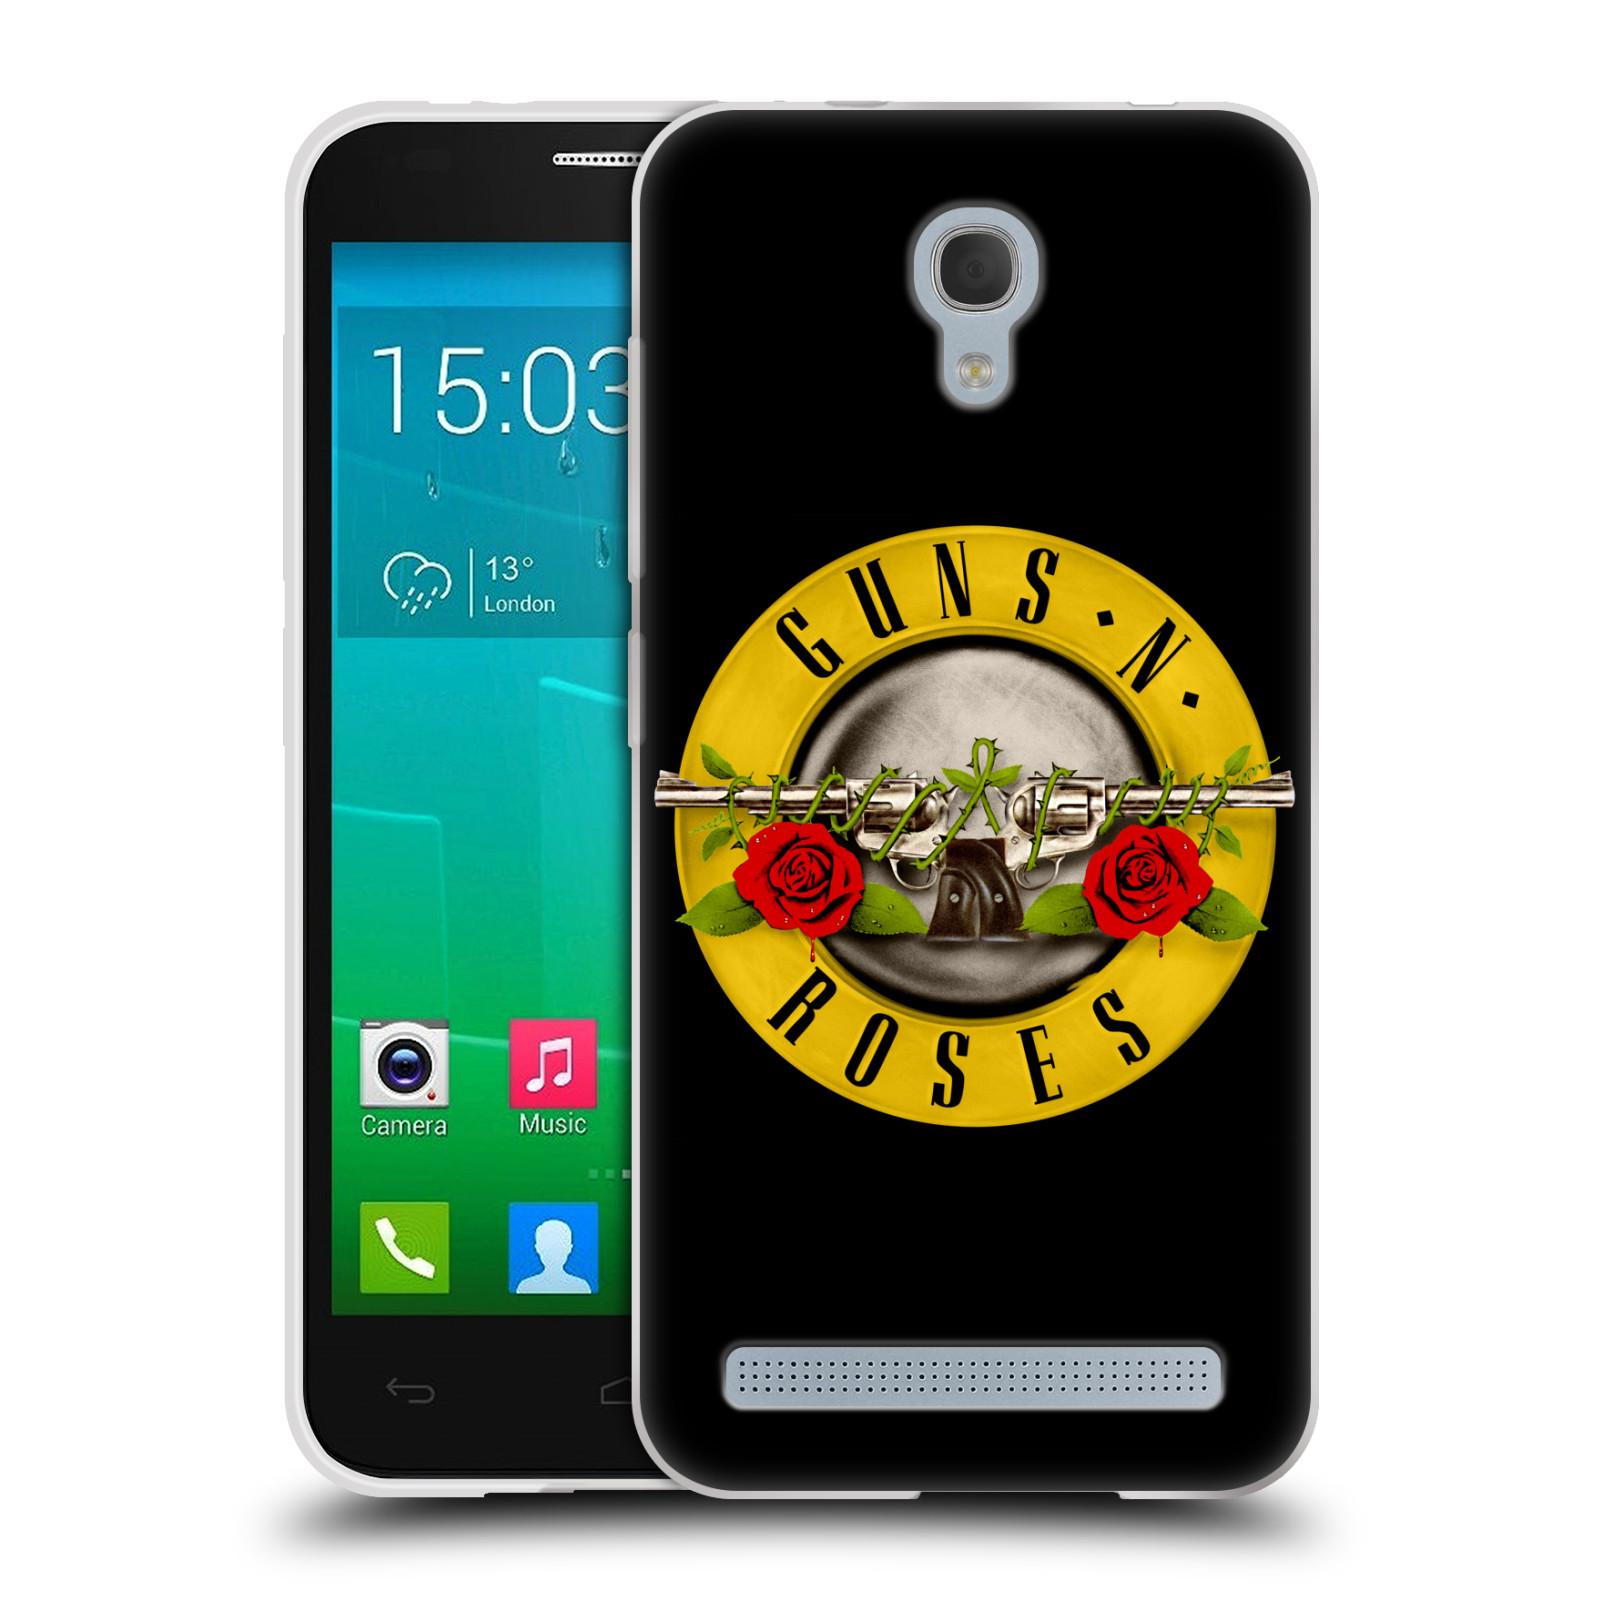 Silikonové pouzdro na mobil Alcatel One Touch Idol 2 Mini S 6036Y HEAD CASE Guns N' Roses - Logo (Silikonový kryt či obal na mobilní telefon licencovaným motivem Guns N' Roses pro Alcatel Idol 2 Mini S OT-6036Y)